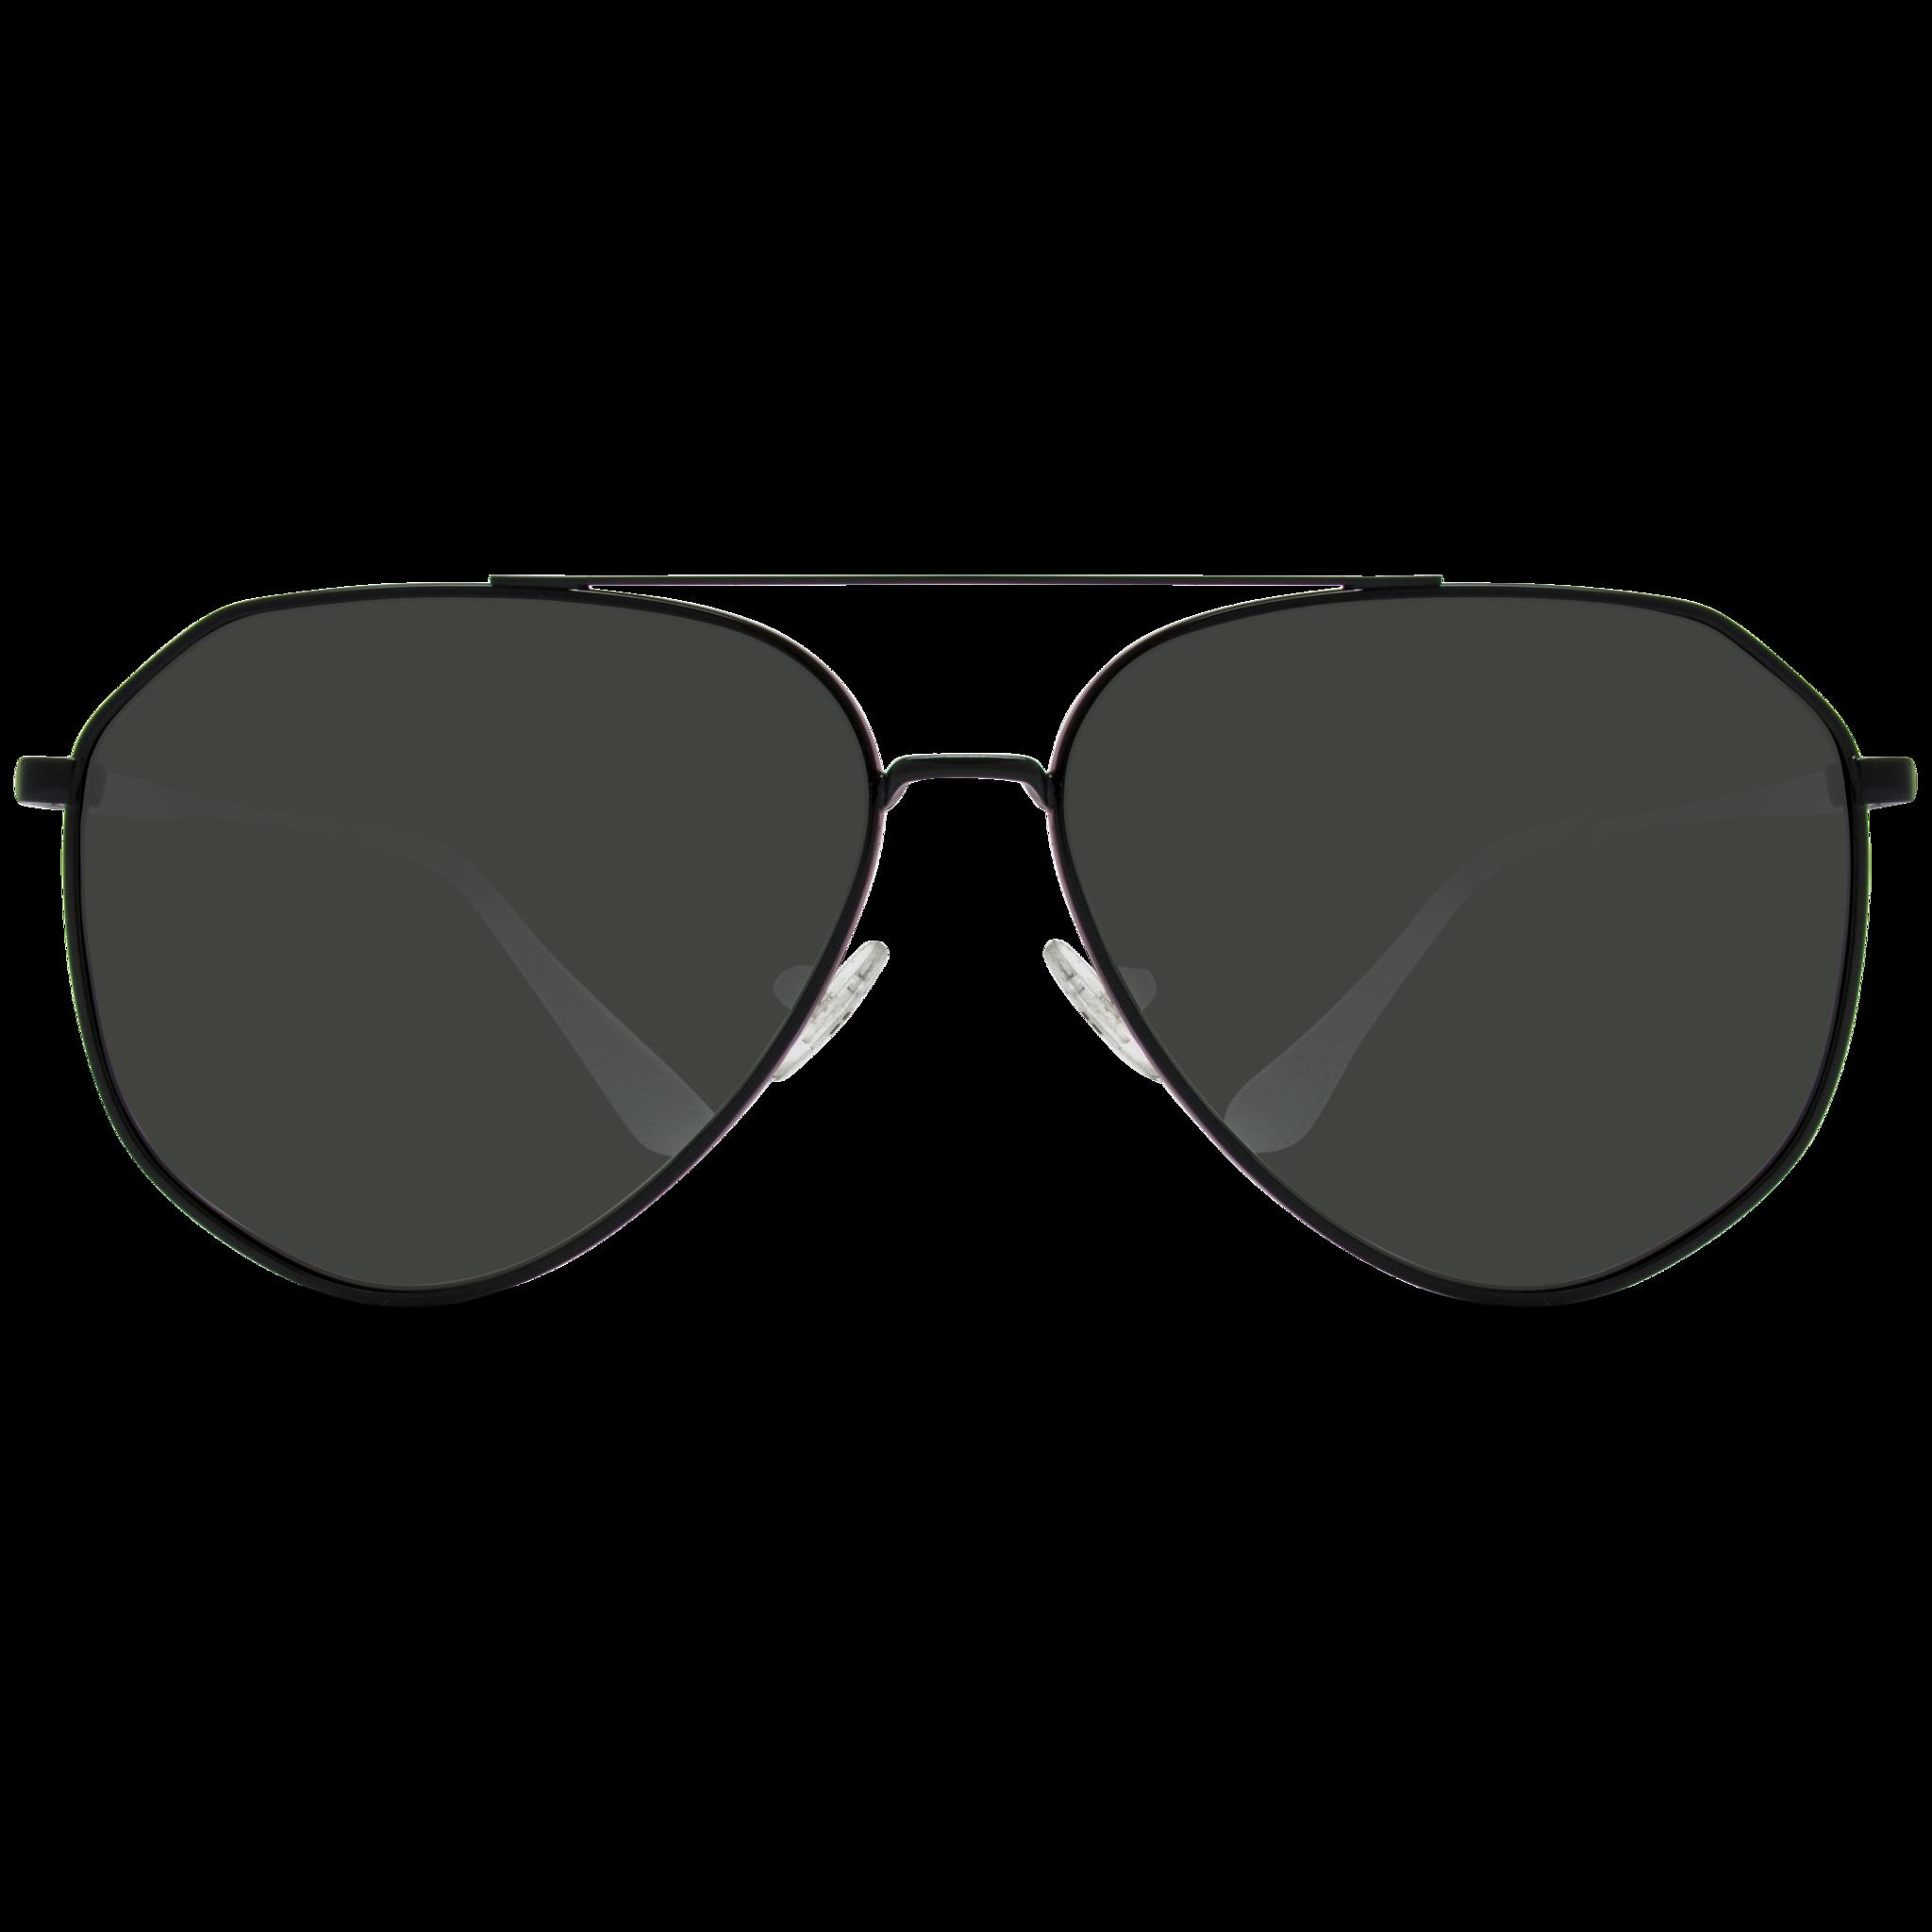 a53a54cf17d black polarized geometric aviator sunglasses for men Polarized Aviator  Sunglasses